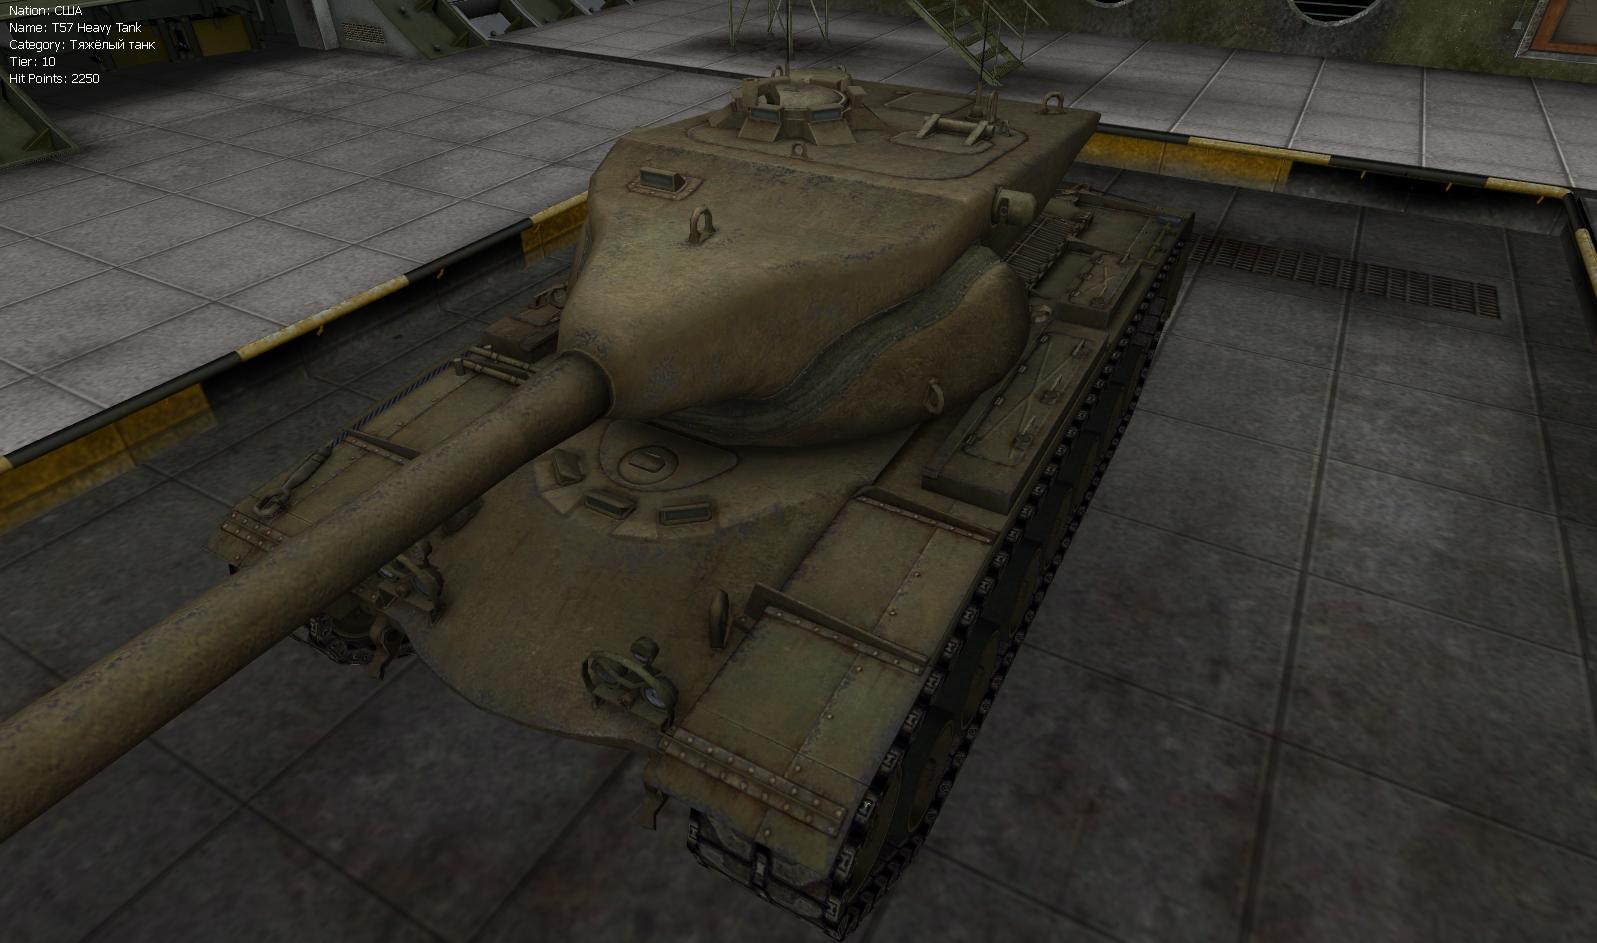 T57 heavy tank 51 66 побед